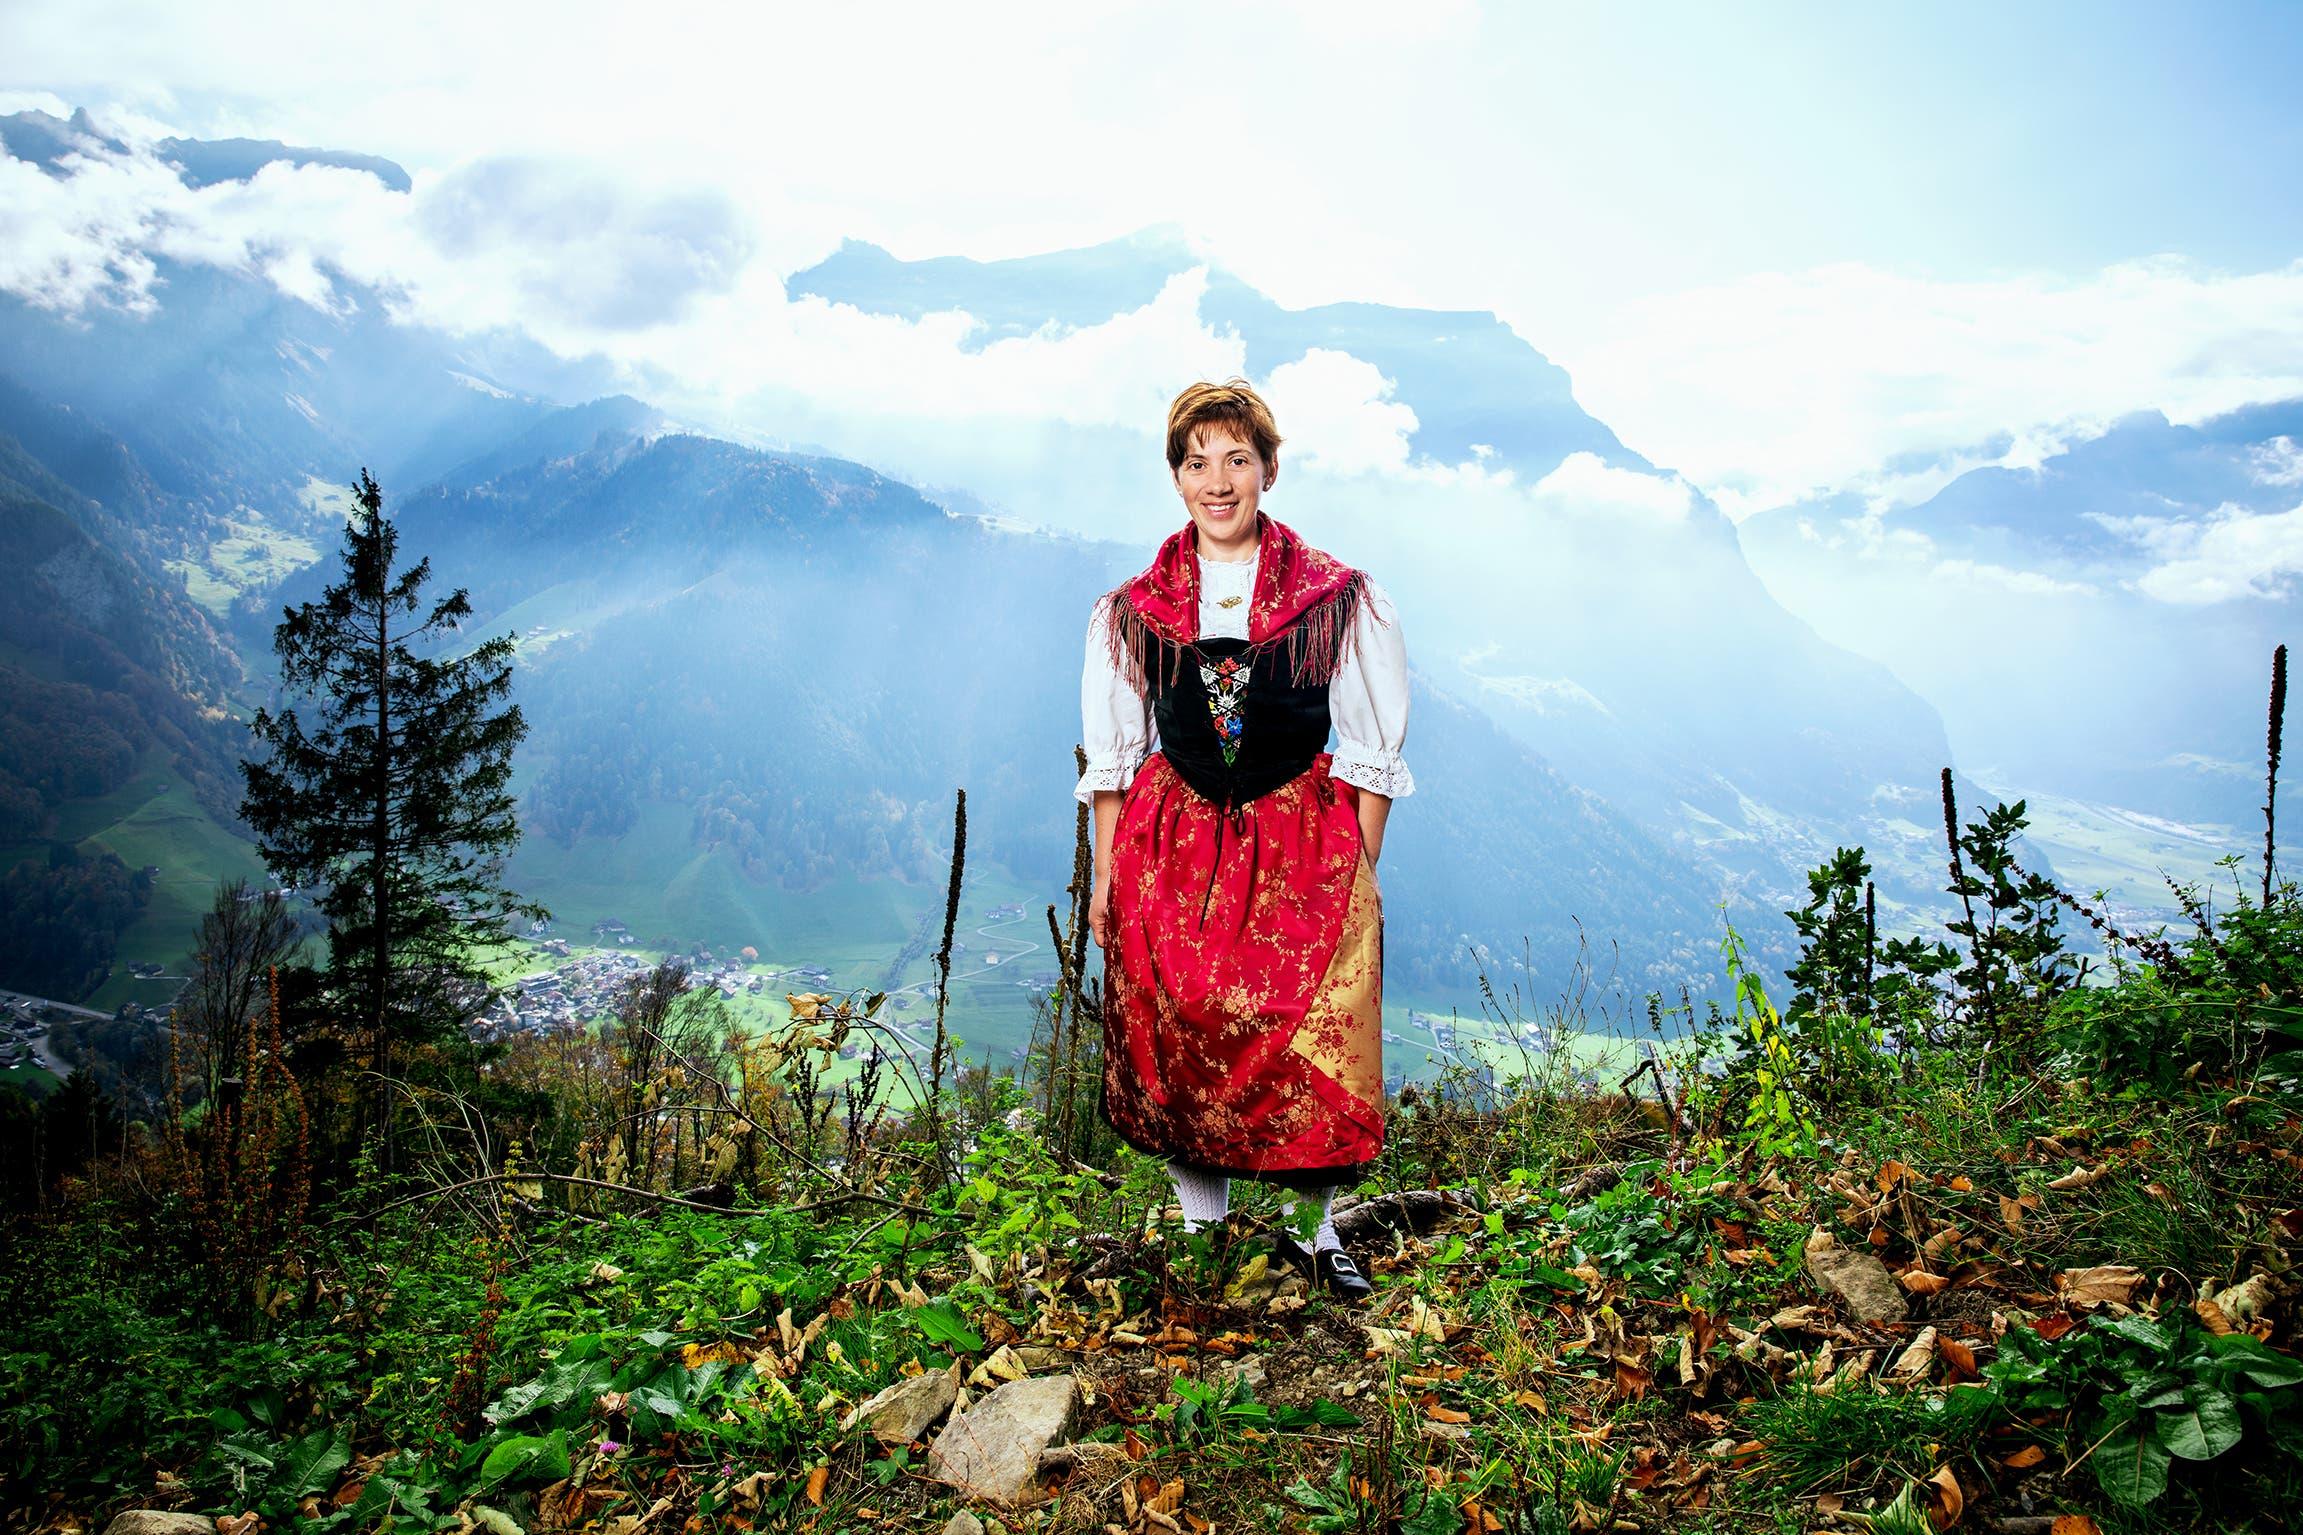 landfrauenküche 2019 finale